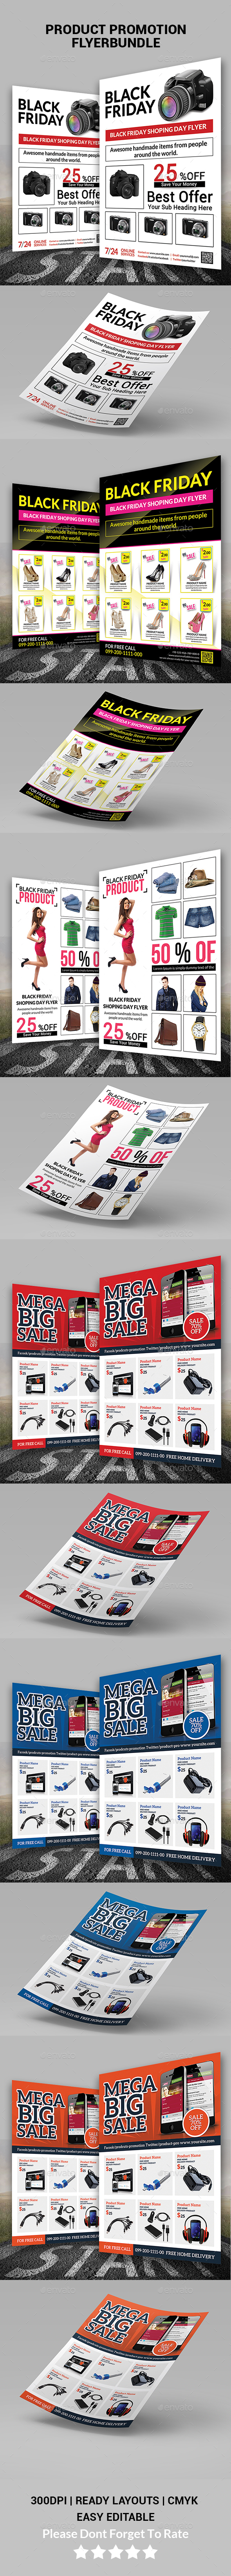 Product Promotion Flyer Bundle Print Templates - Corporate Flyers